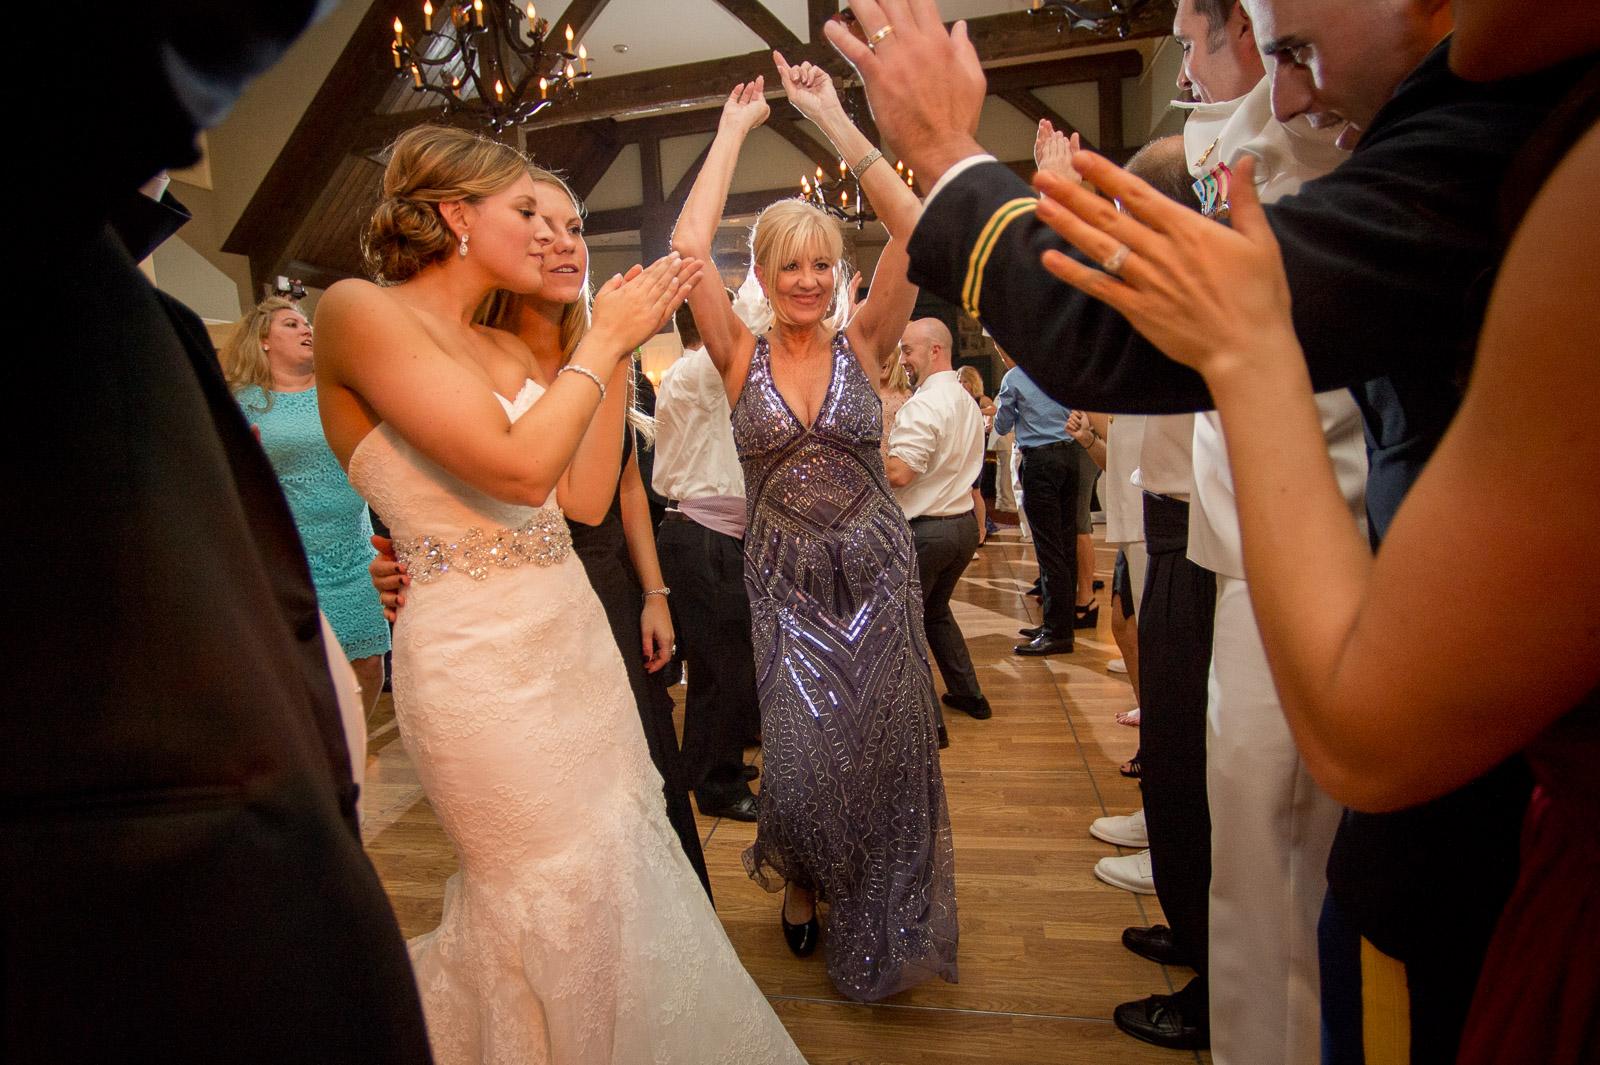 The wedding of Scott & Allison, The Tuxedo Club. Tuexedo, NY. Craig Warga